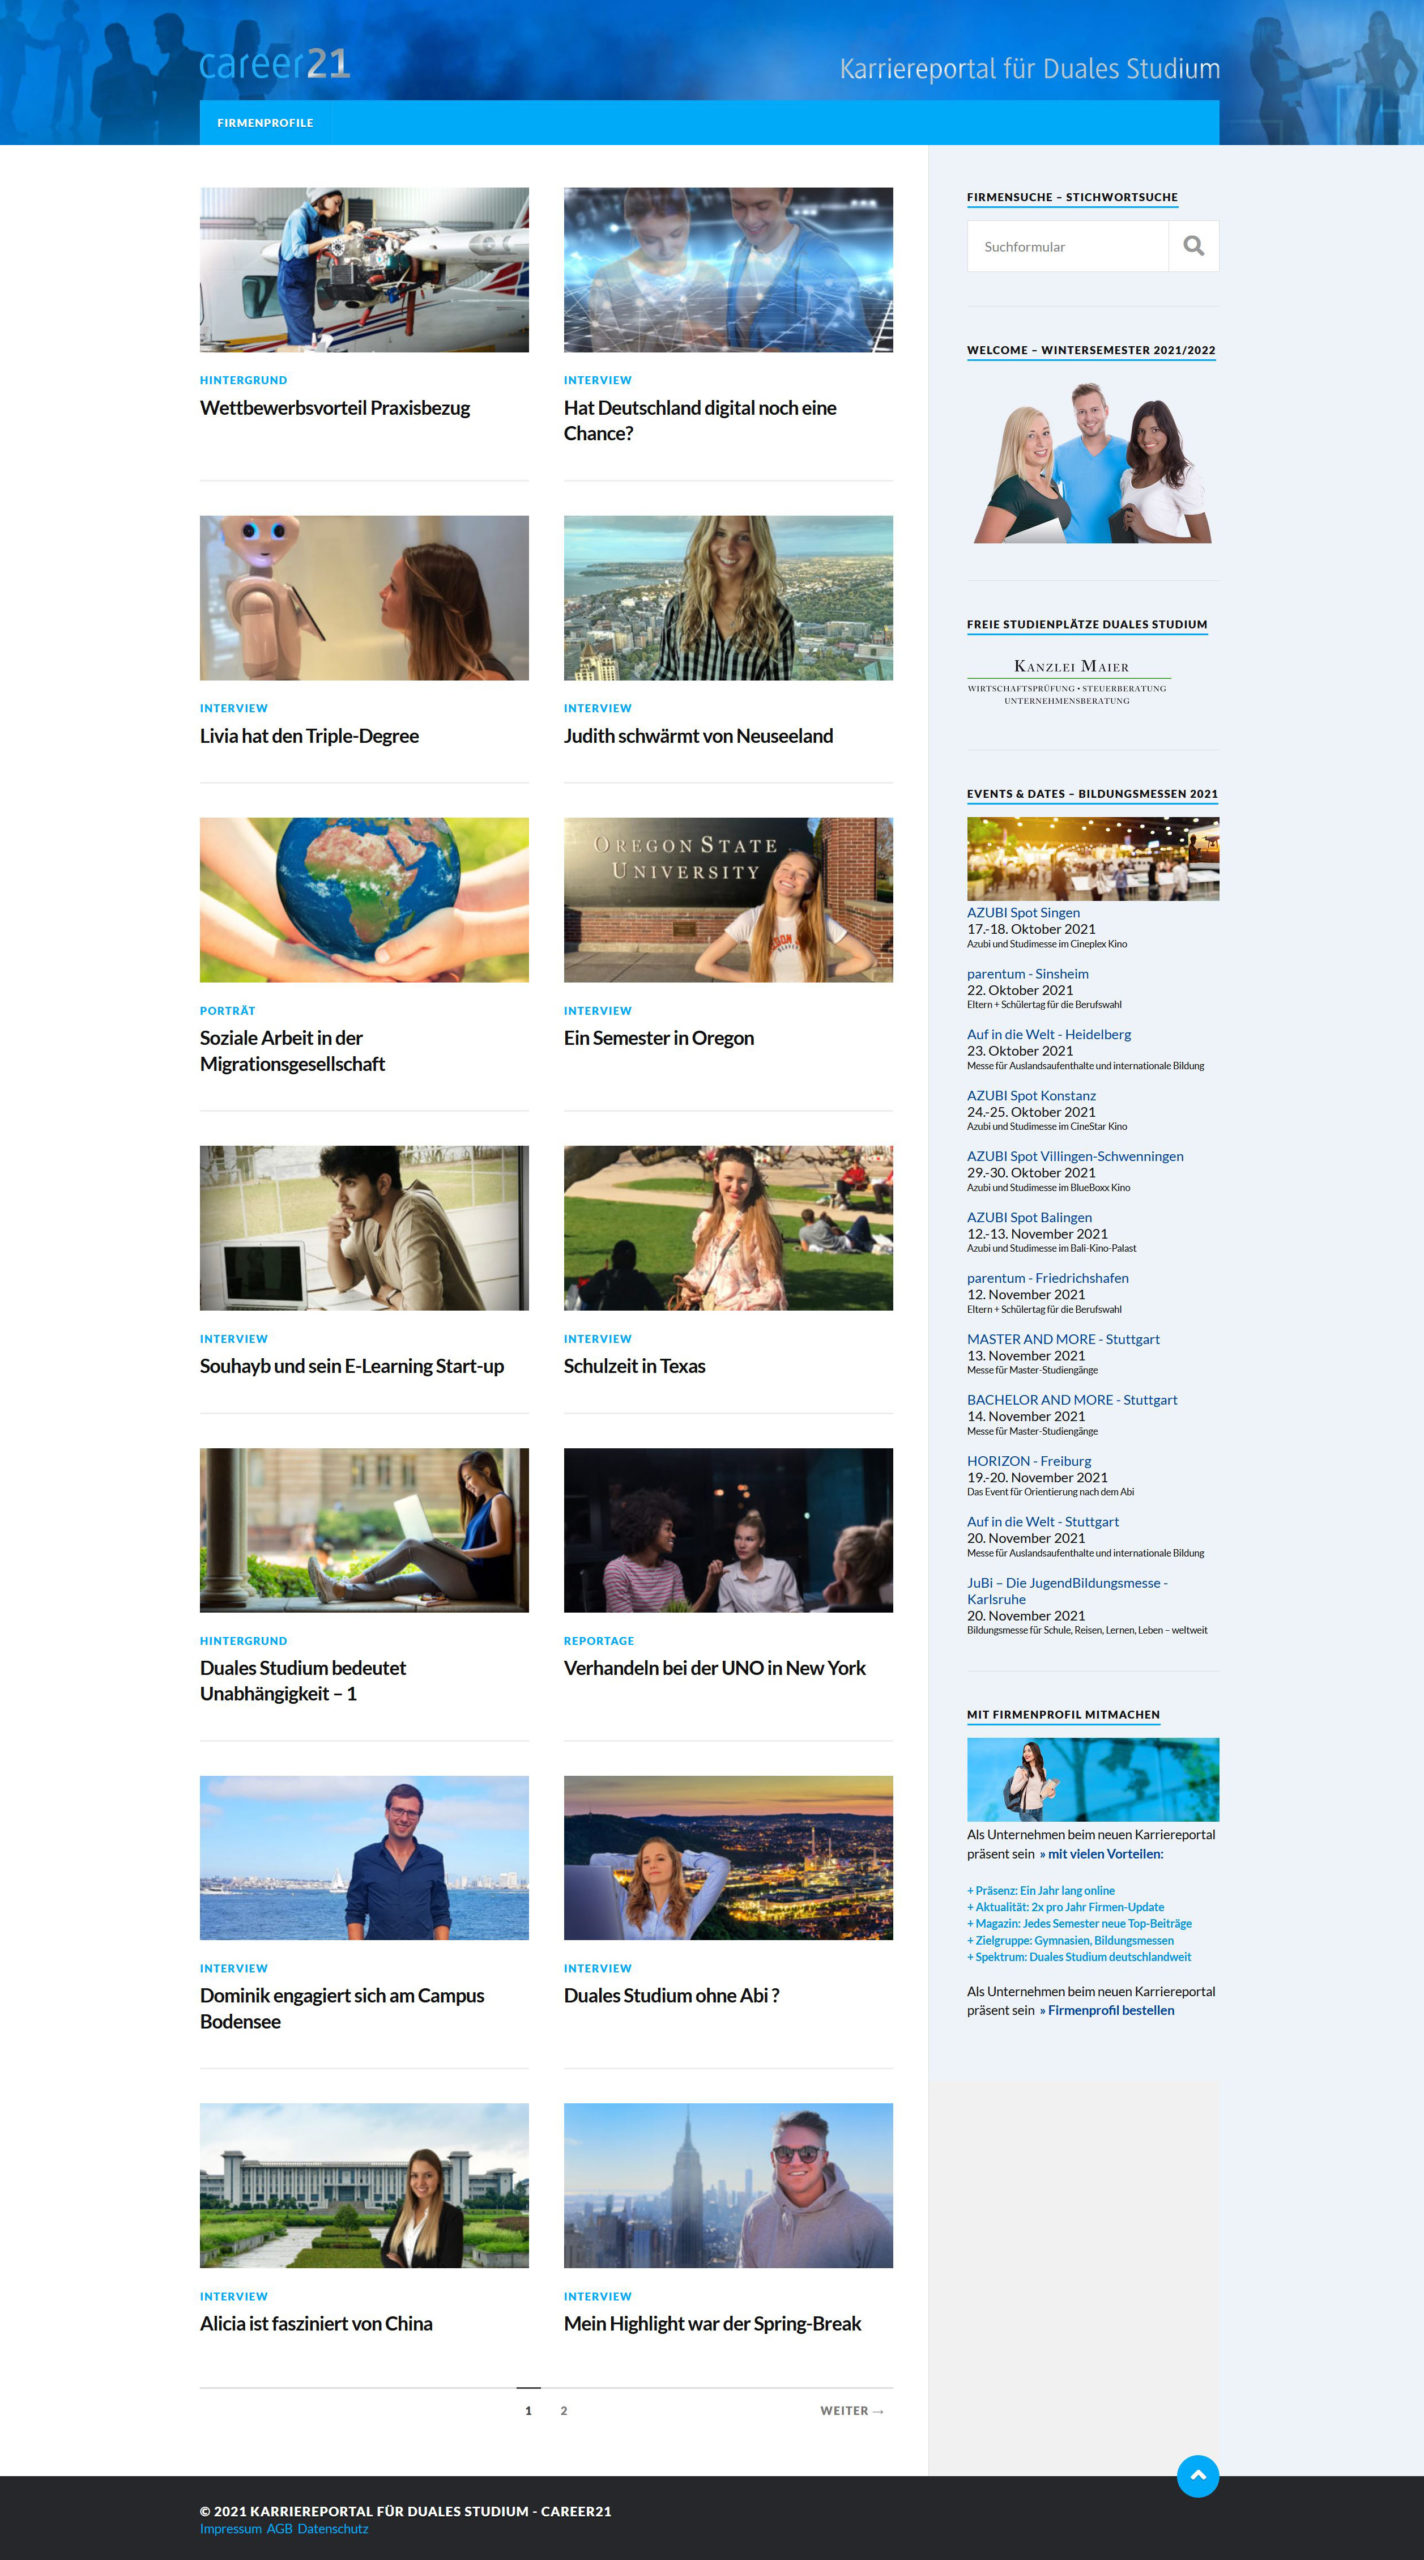 career21 - Karriereportal für Duales Studium Internet Webdesign